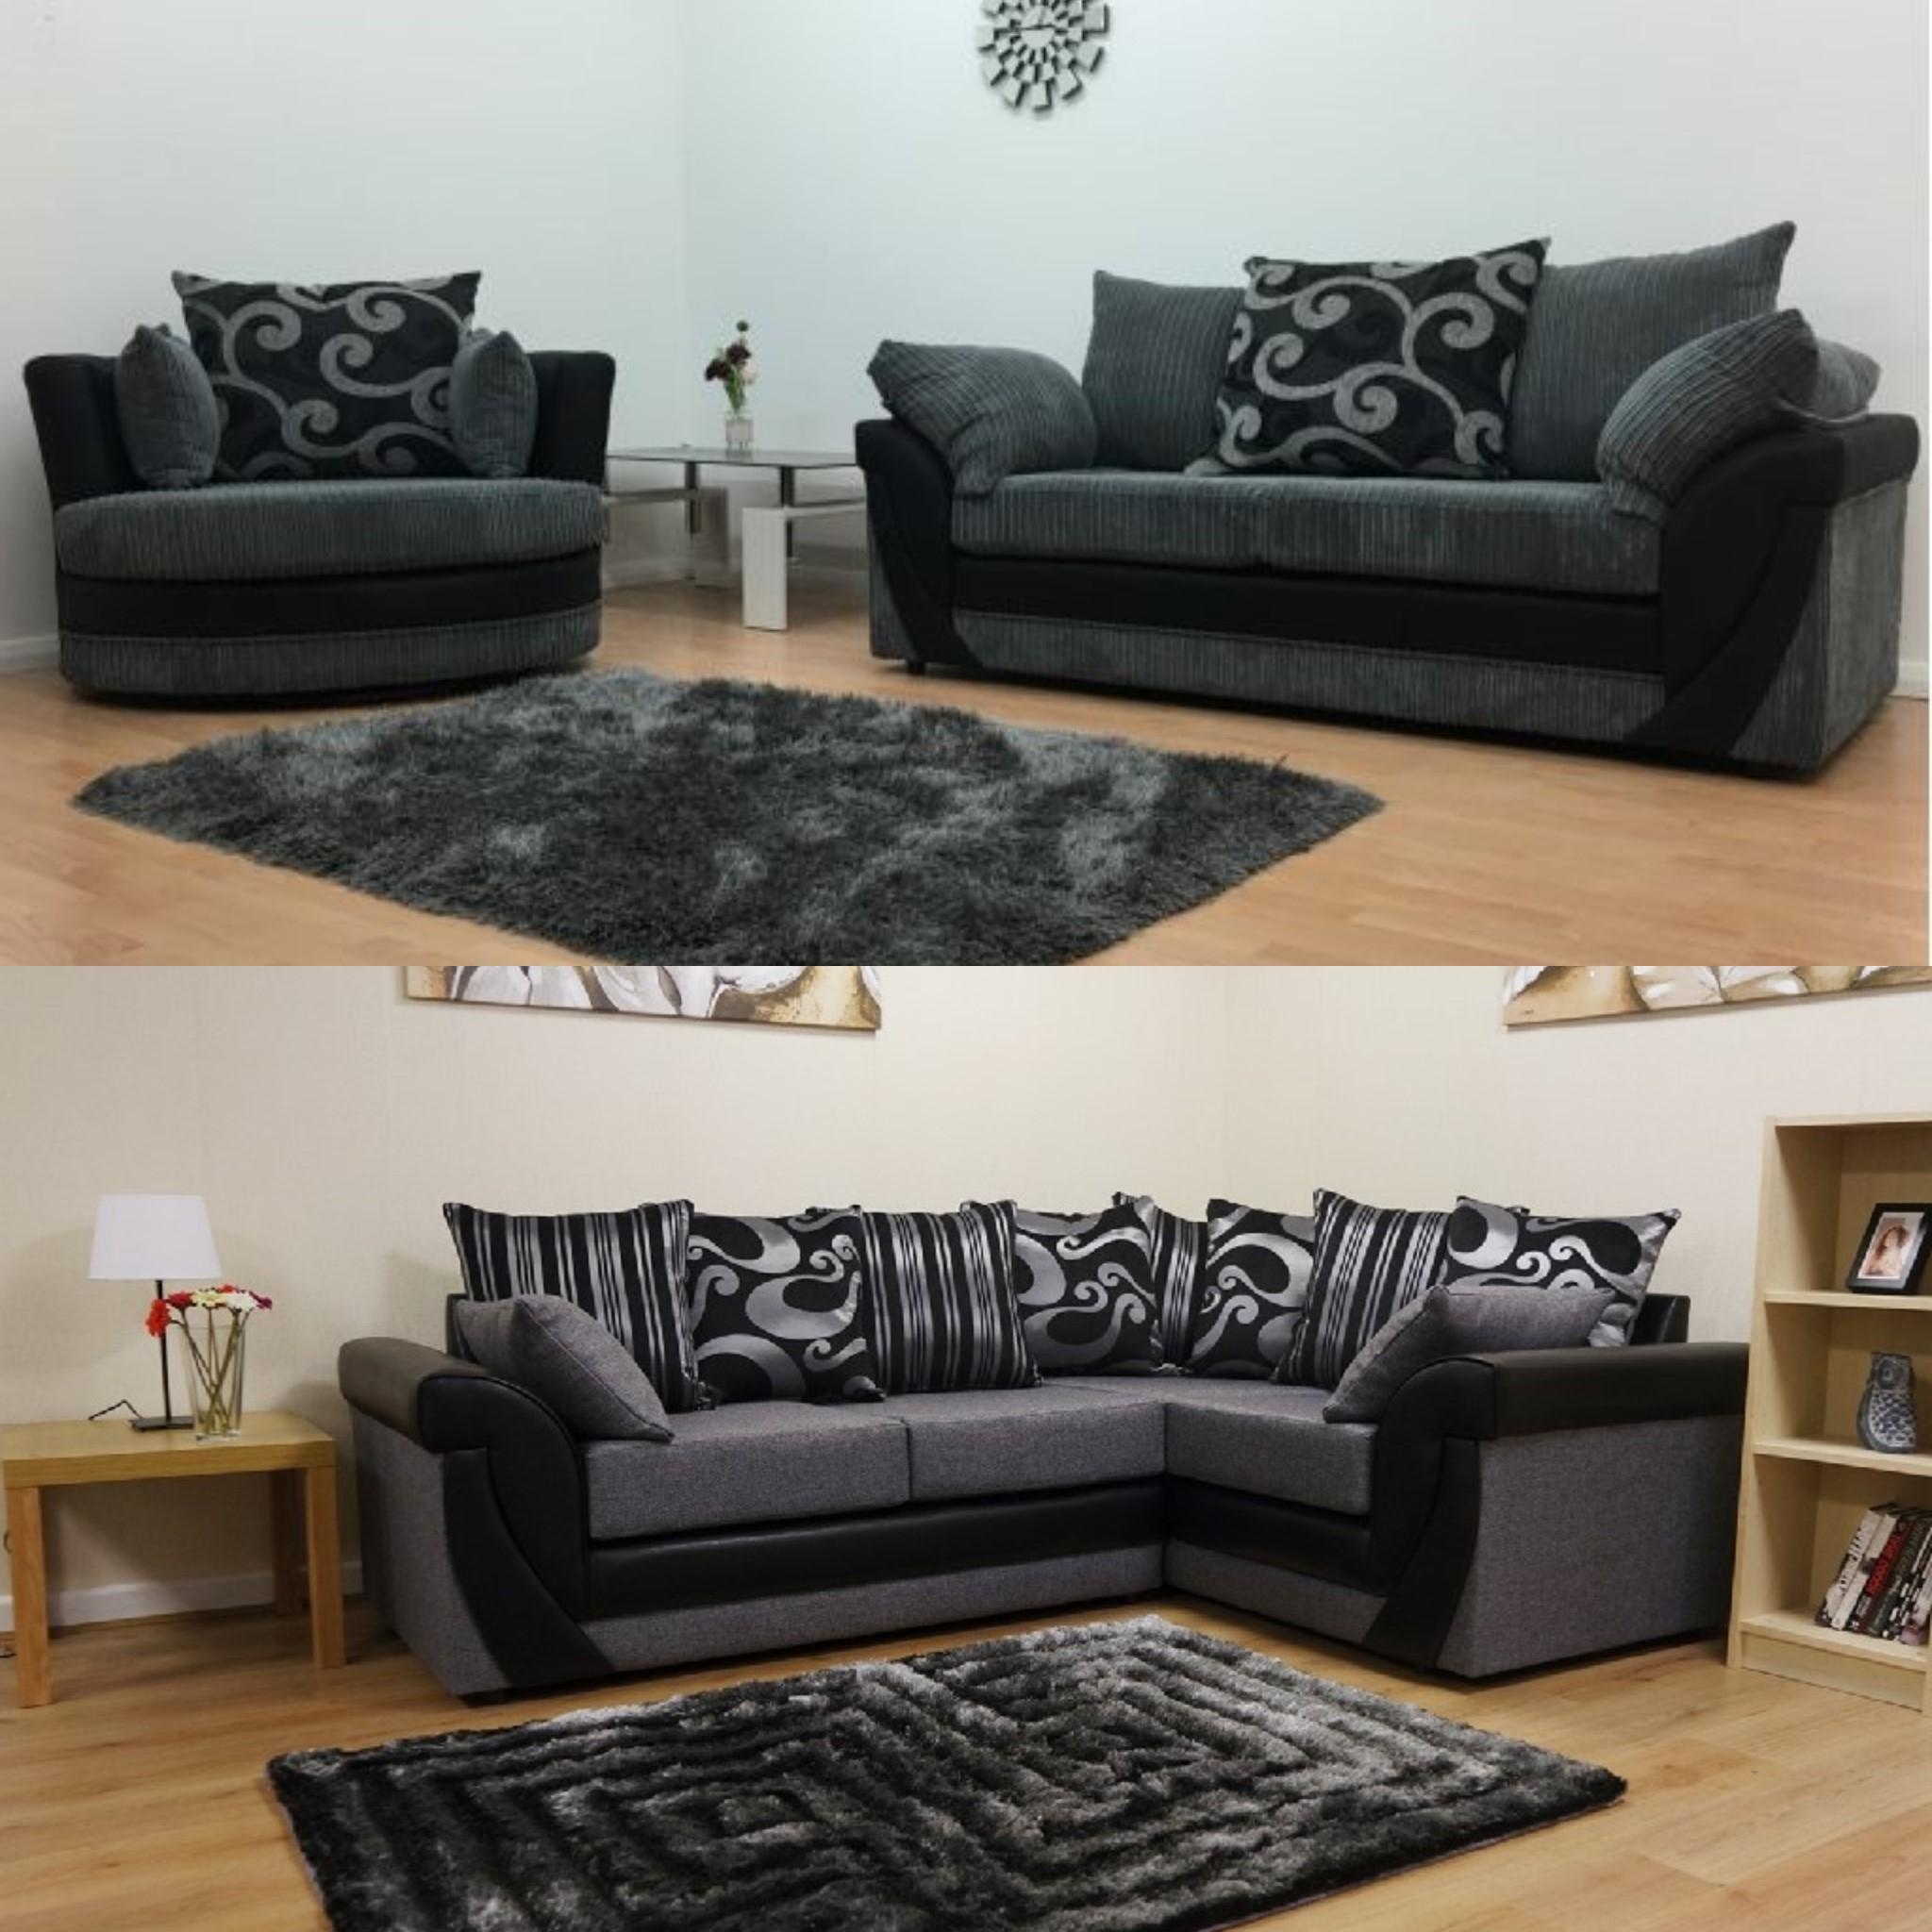 Latest Corner Sofa And Swivel Chairs In Lush Fabric Corner Sofa Set – Sofastorm (View 12 of 20)